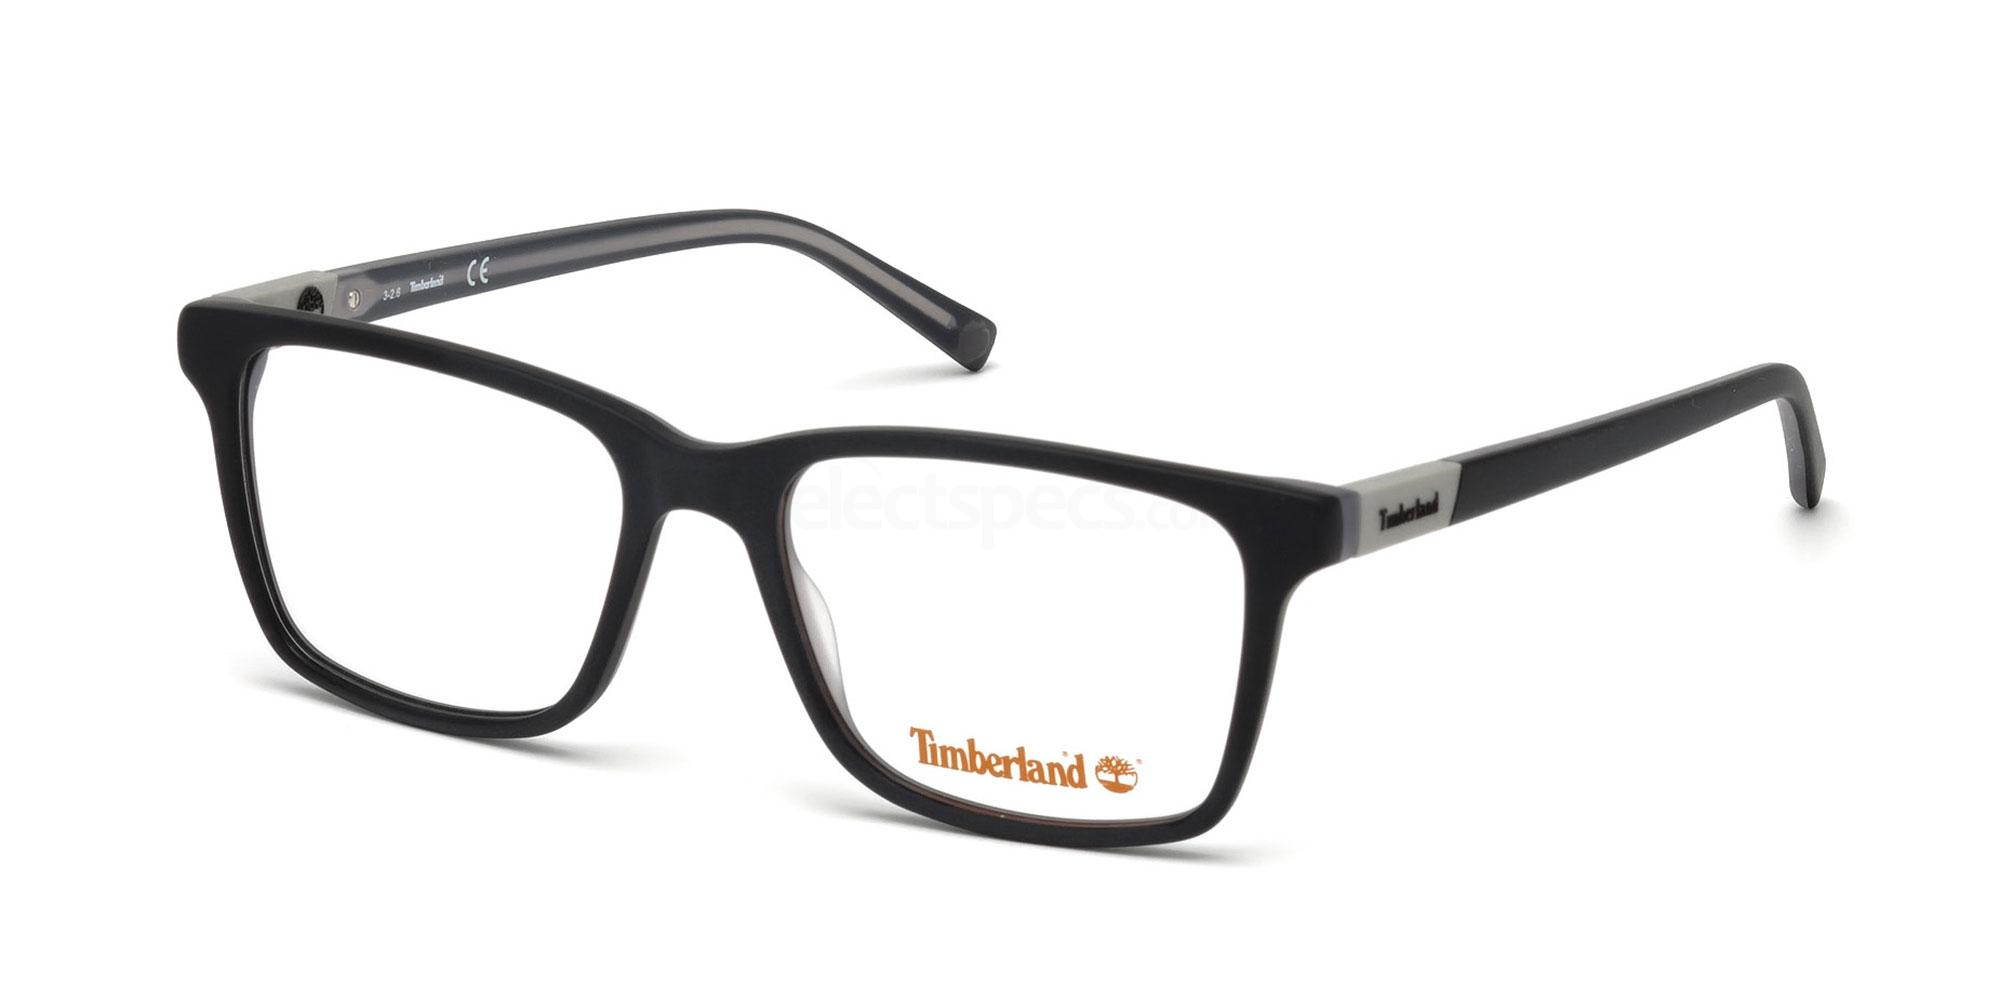 002 TB1574 Glasses, Timberland